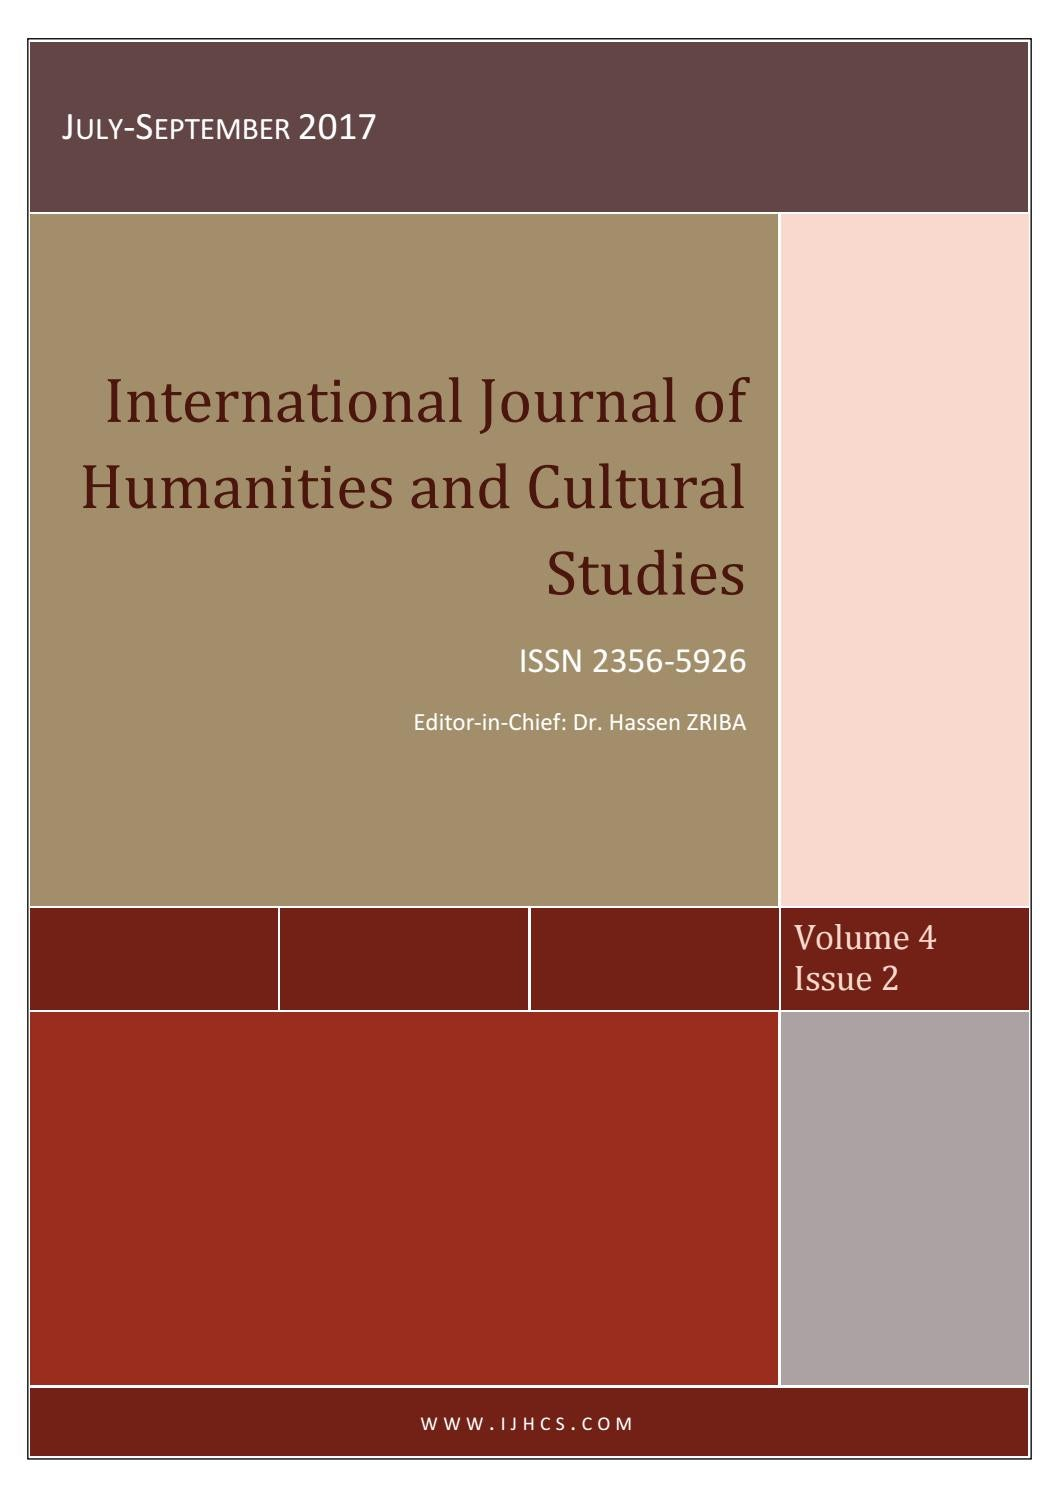 Full issue (v4i2) by IJHCS - issuu